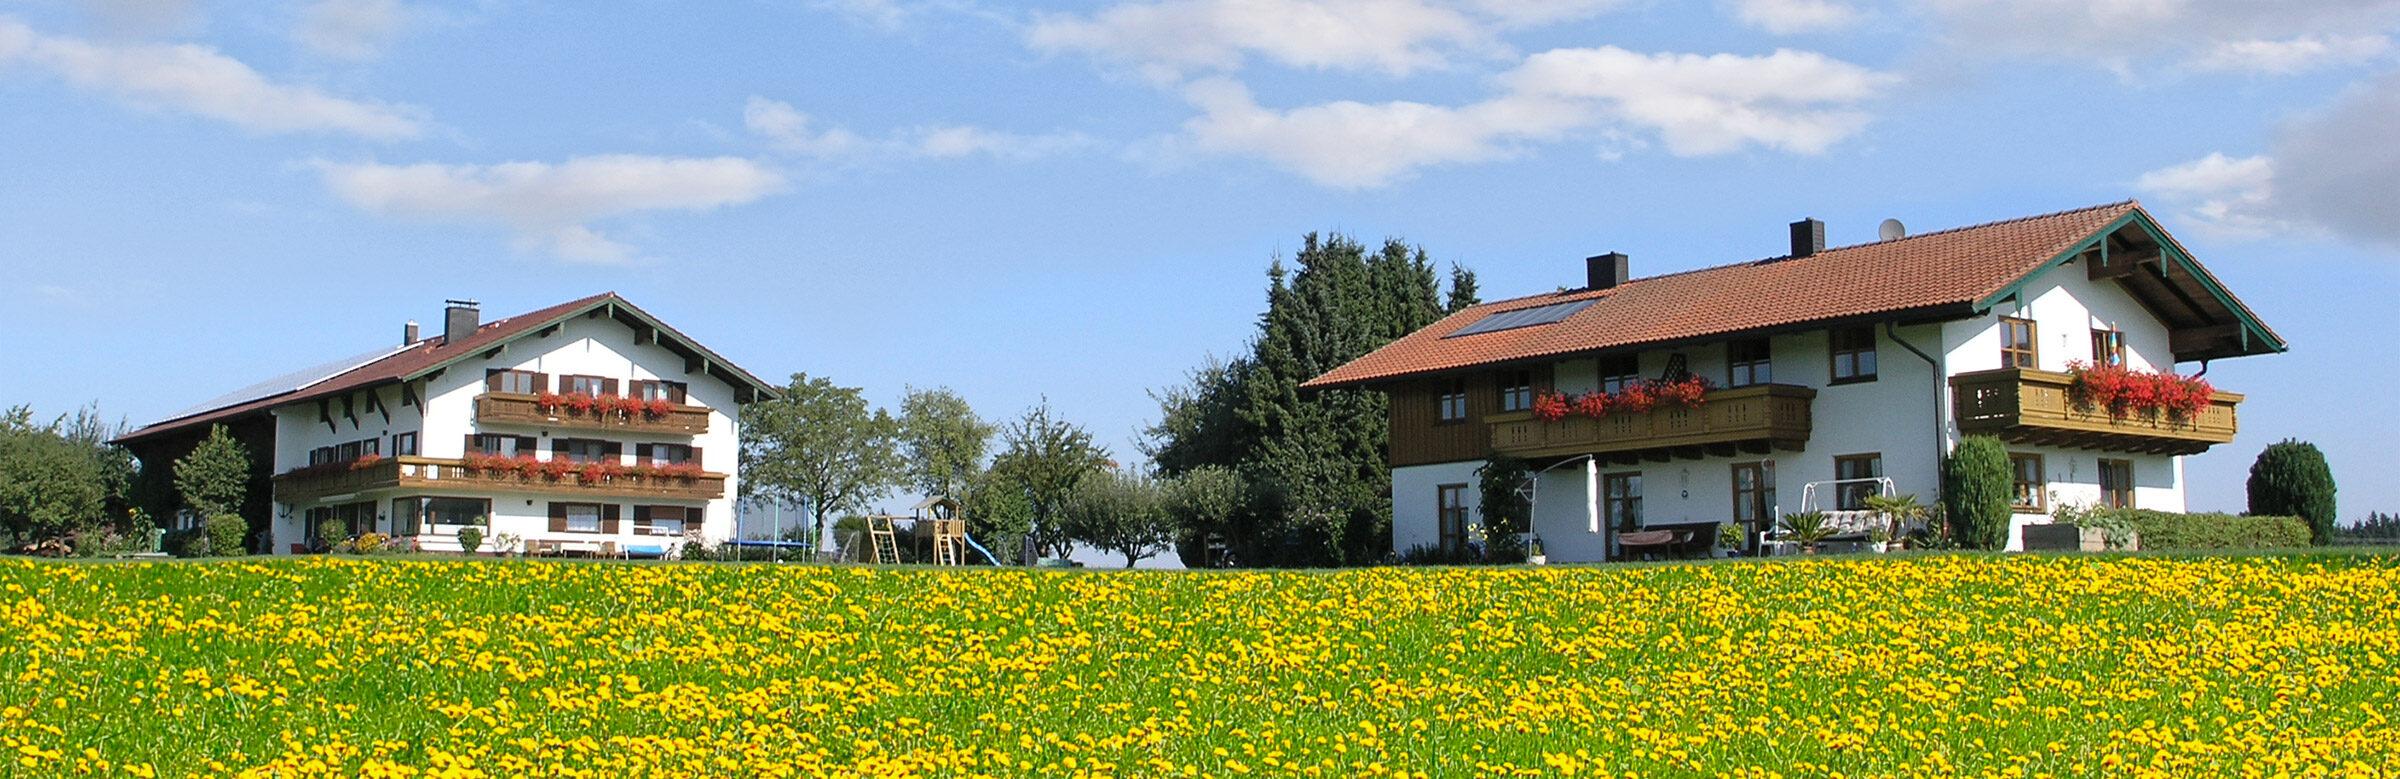 Urbanhof | Fam. Reif | Urlaub am Chiemsee